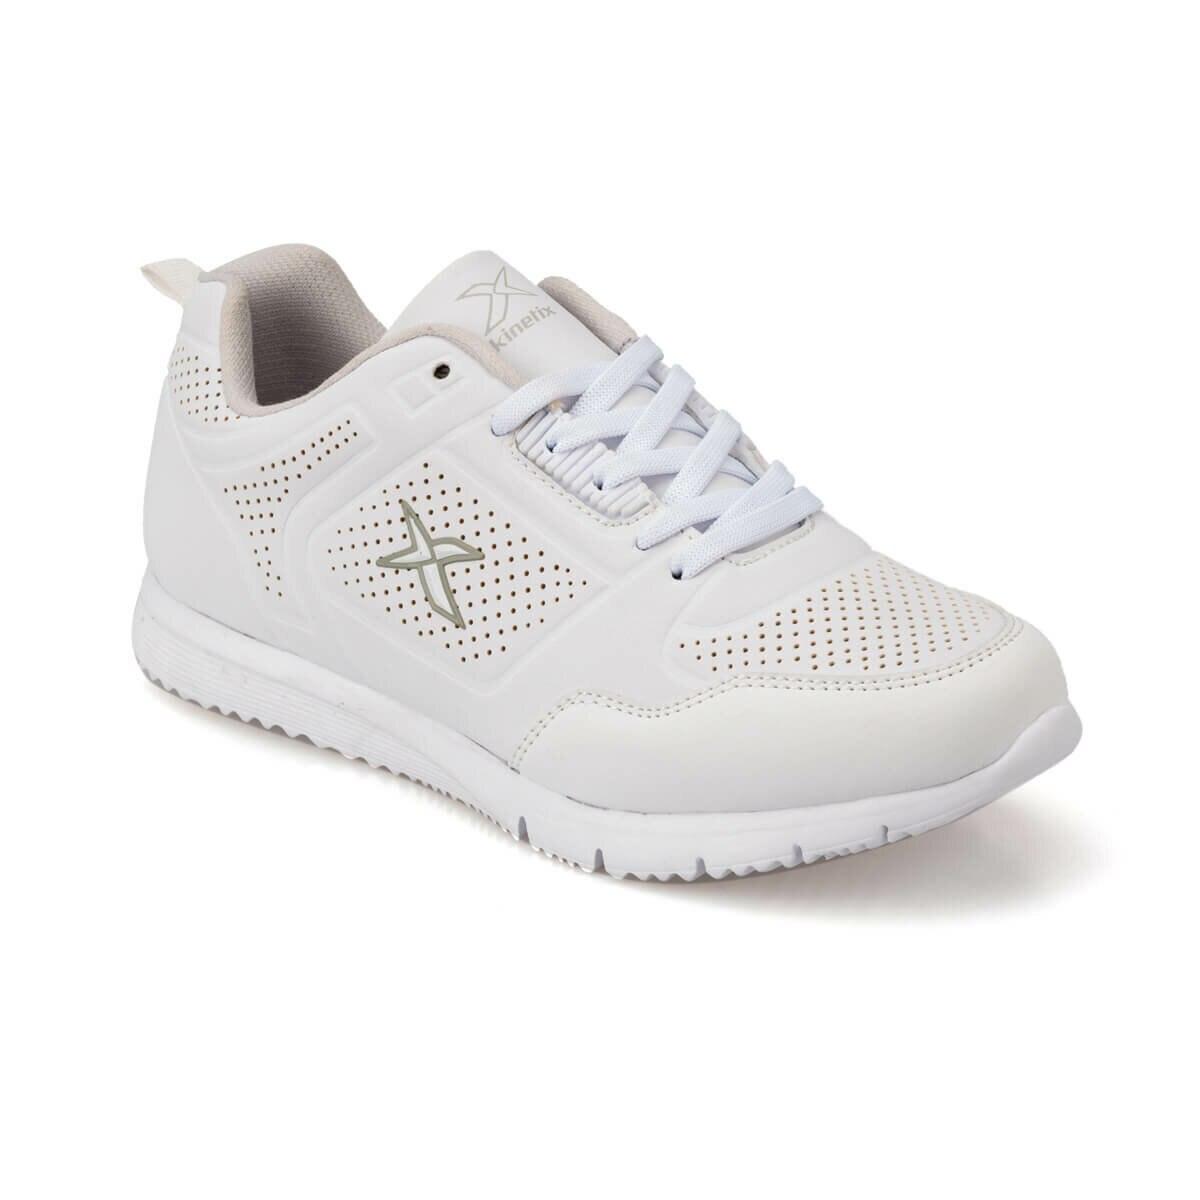 FLO LORA W 9PR White Women 'S Sneaker Shoes KINETIX